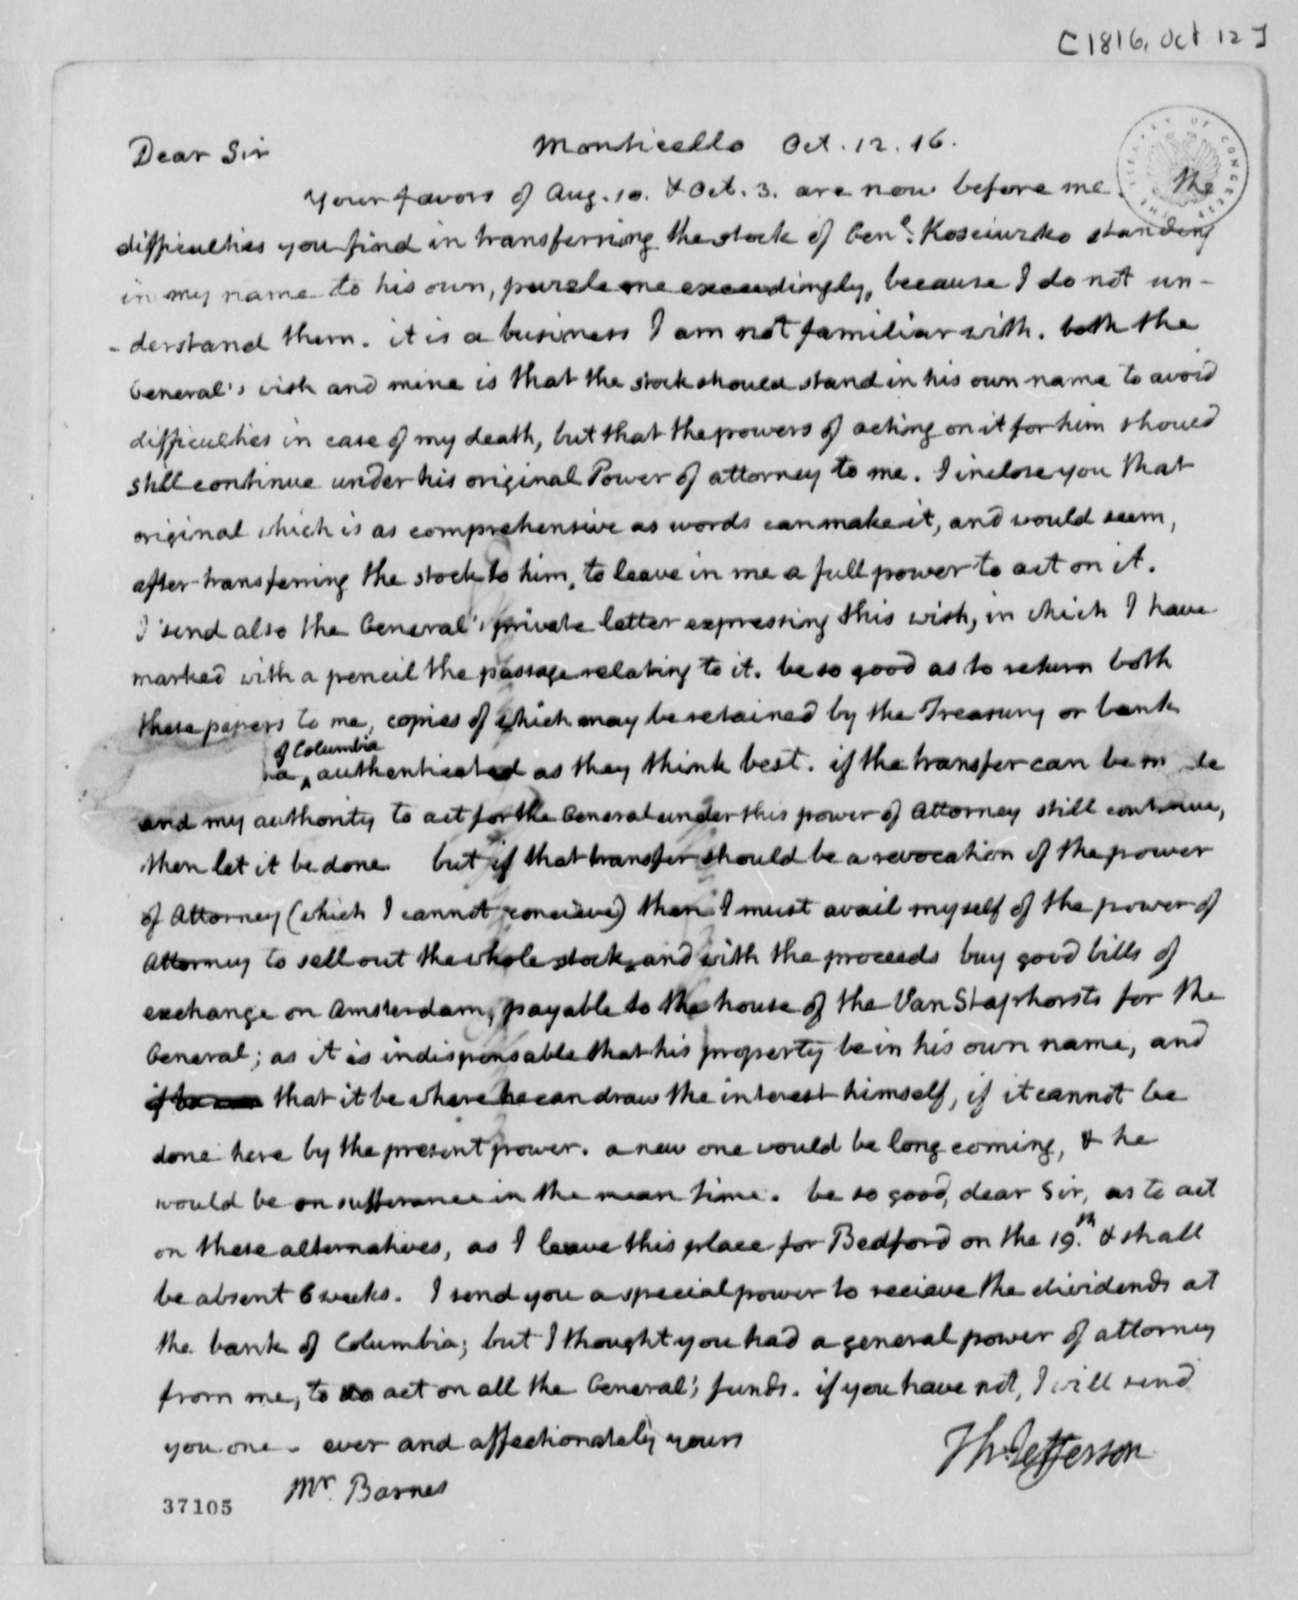 Thomas Jefferson to John S. Barnes, October 12, 1816